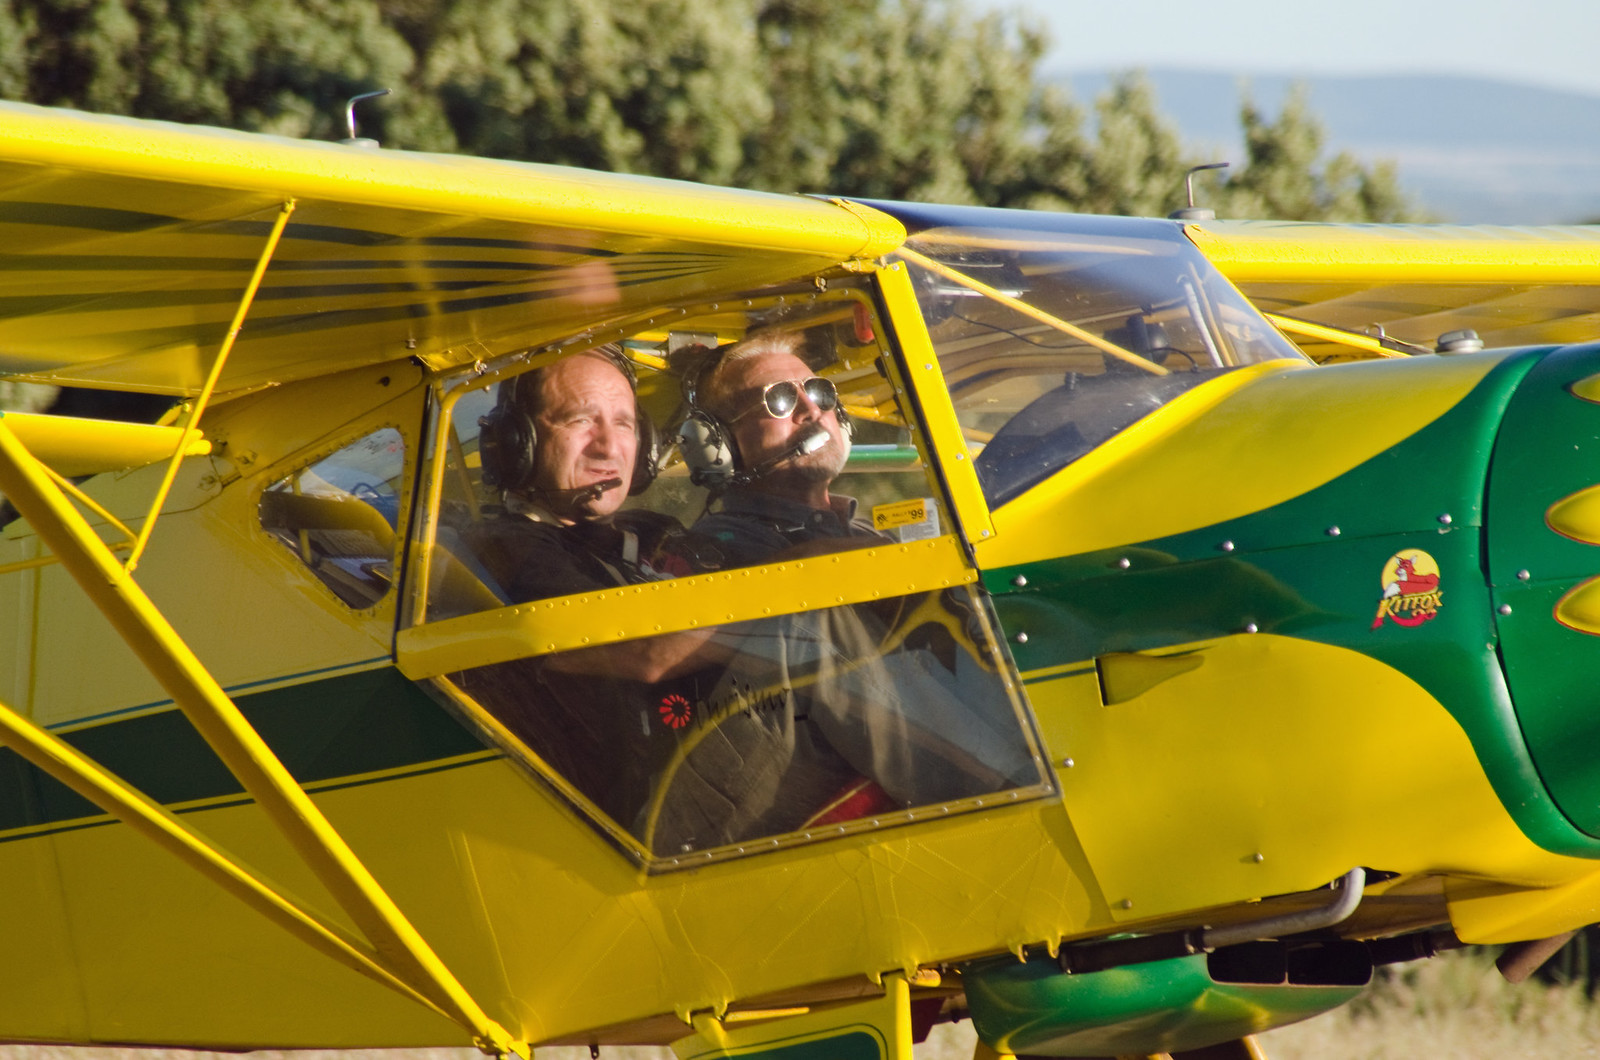 Aerodromo Kitfox  vuelo como premio de sorteo promocional (12)